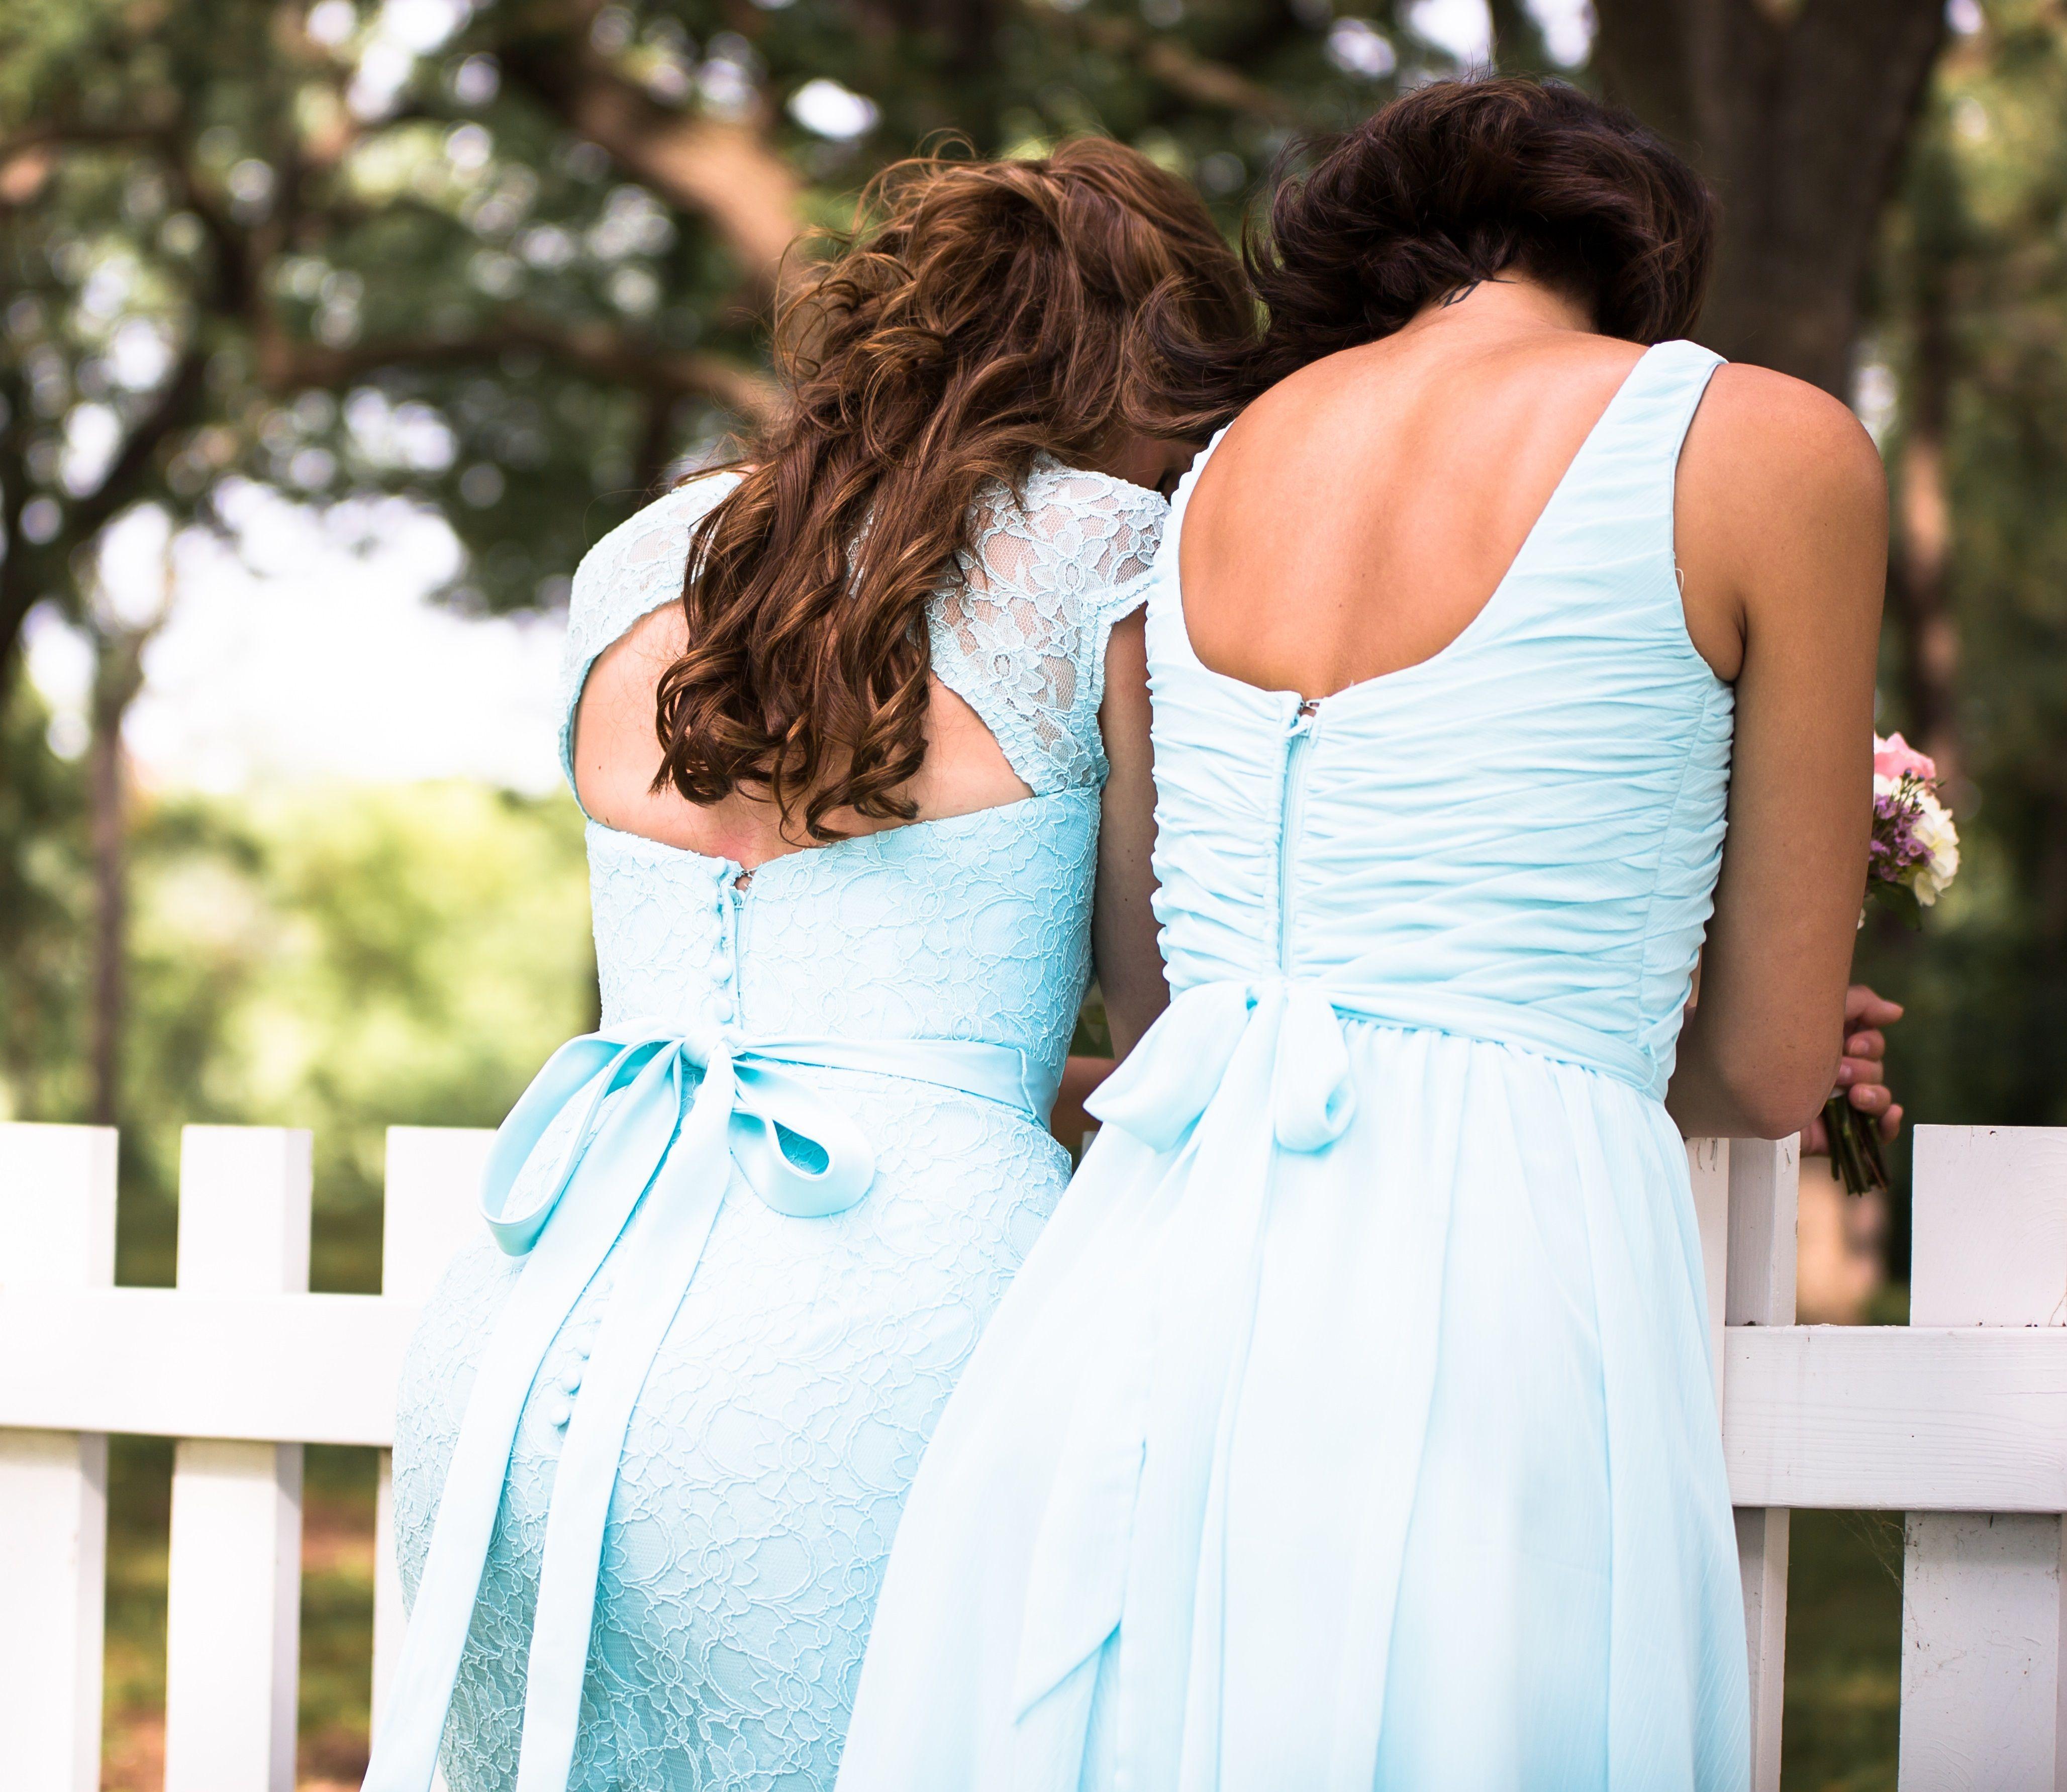 Mint bridesmaid dresses knee length bridesmaid dresses kennedy mint bridesmaid dresses knee length bridesmaid dresses kennedy blue ombrellifo Images